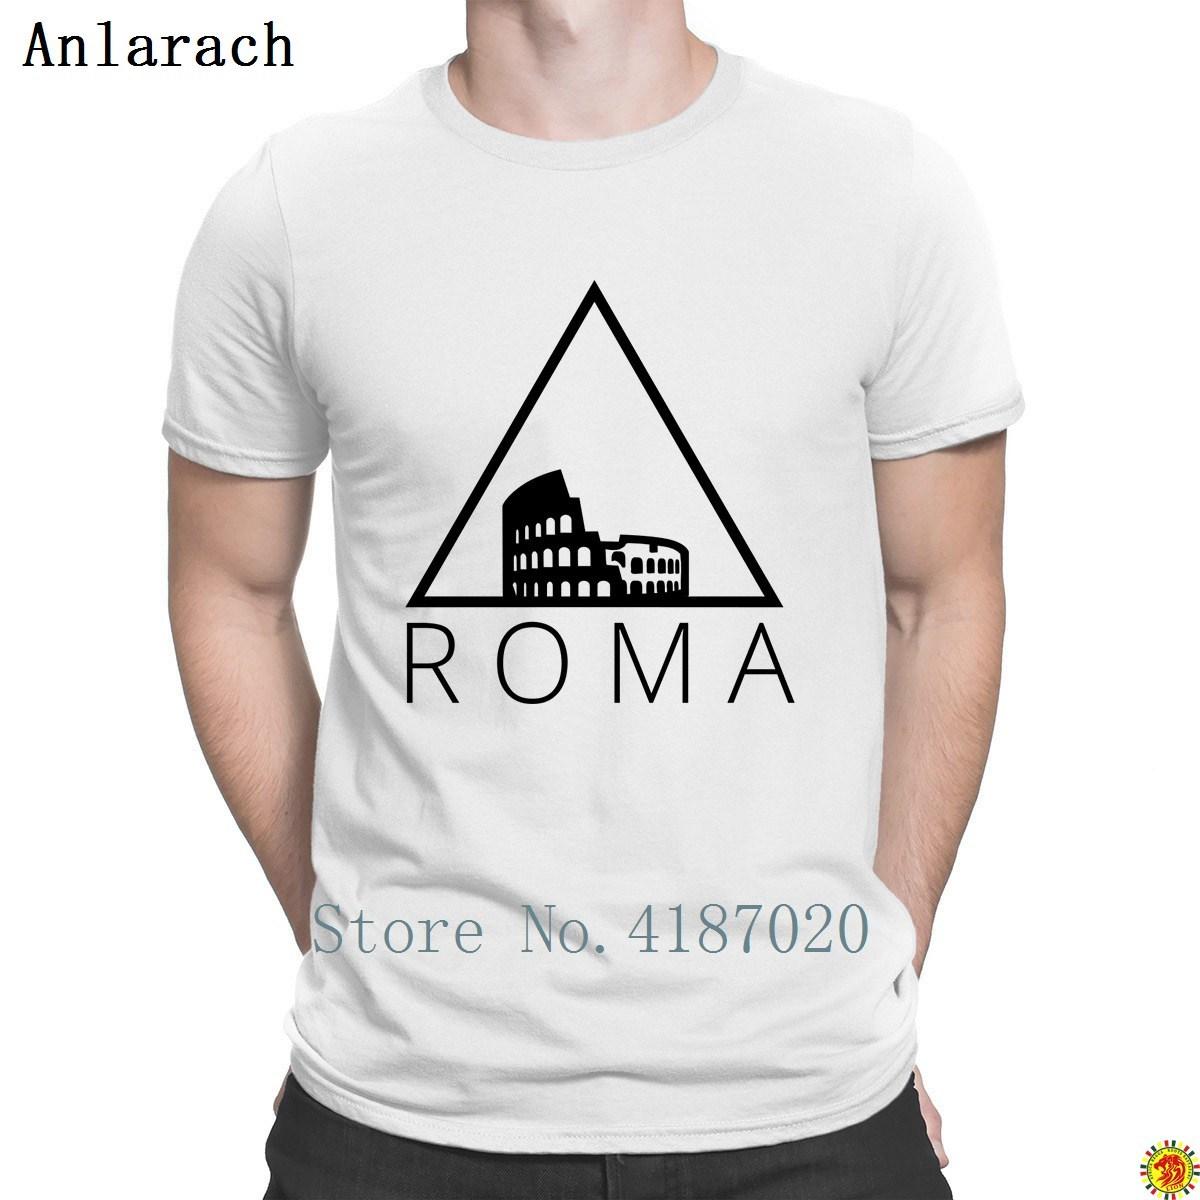 Roma Hipster Dreiecke T-shirts Buchstaben Angepasst Lustig T Tops Herren T-Shirt Frühling Herbst Ausgestattet Kurzarm Heißer Verkauf